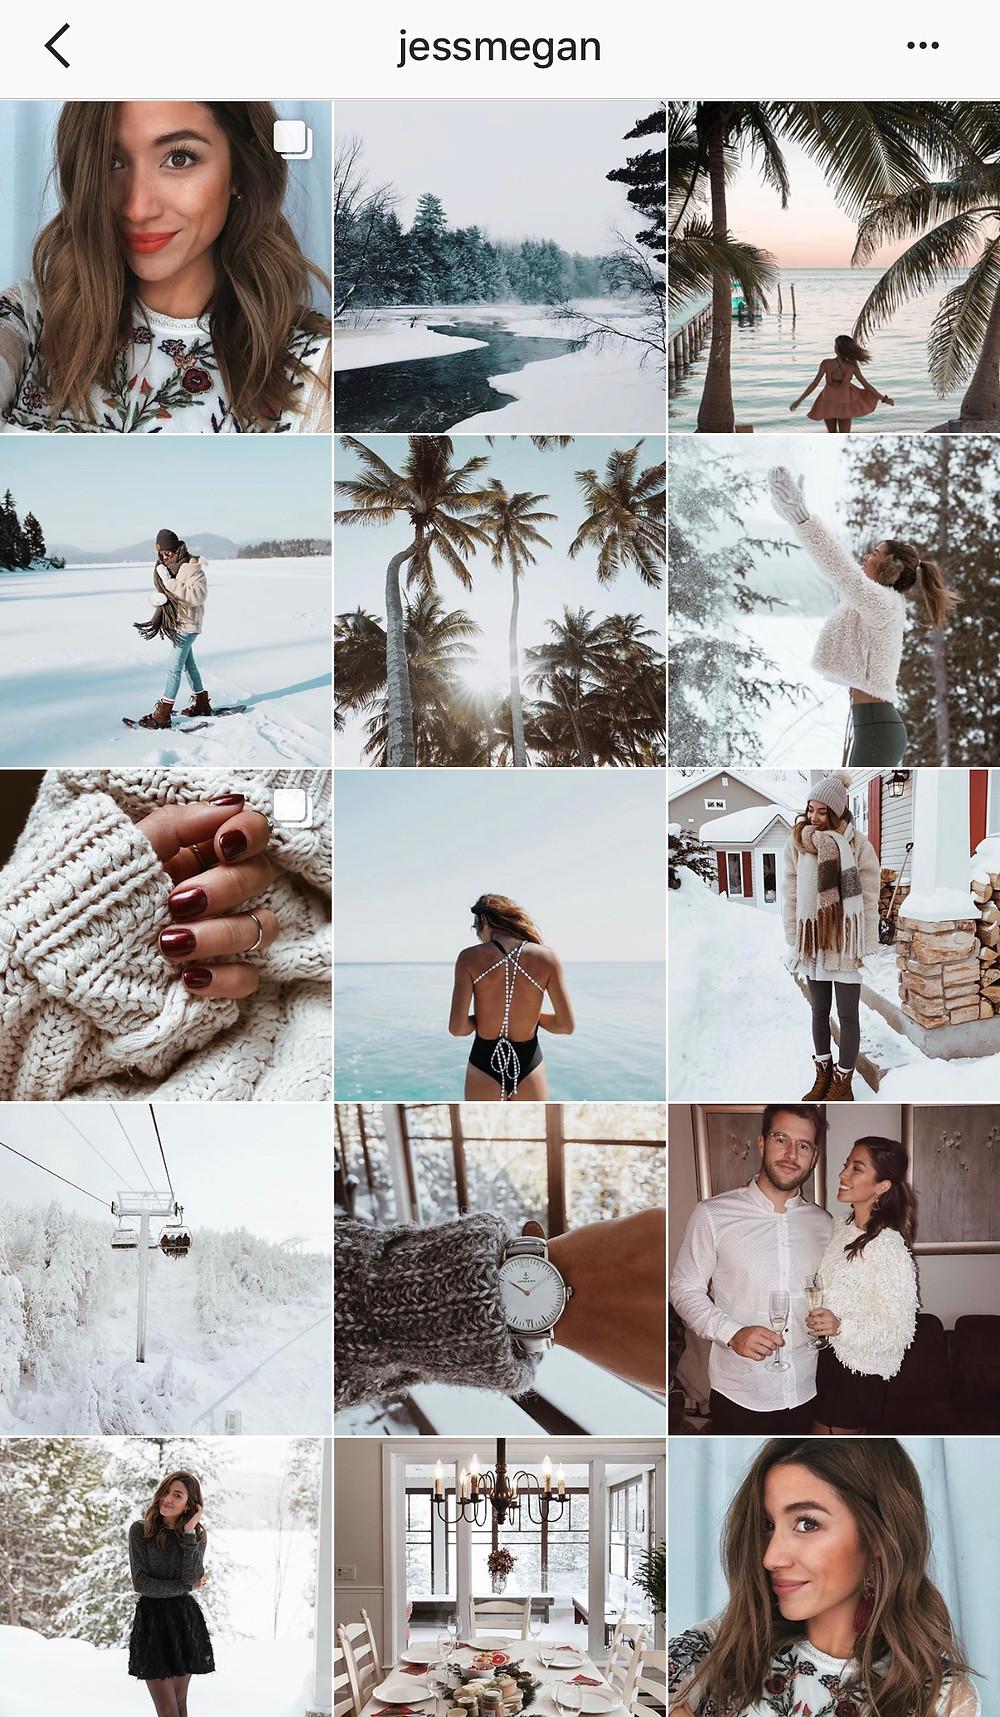 jessmegan sur Instagram